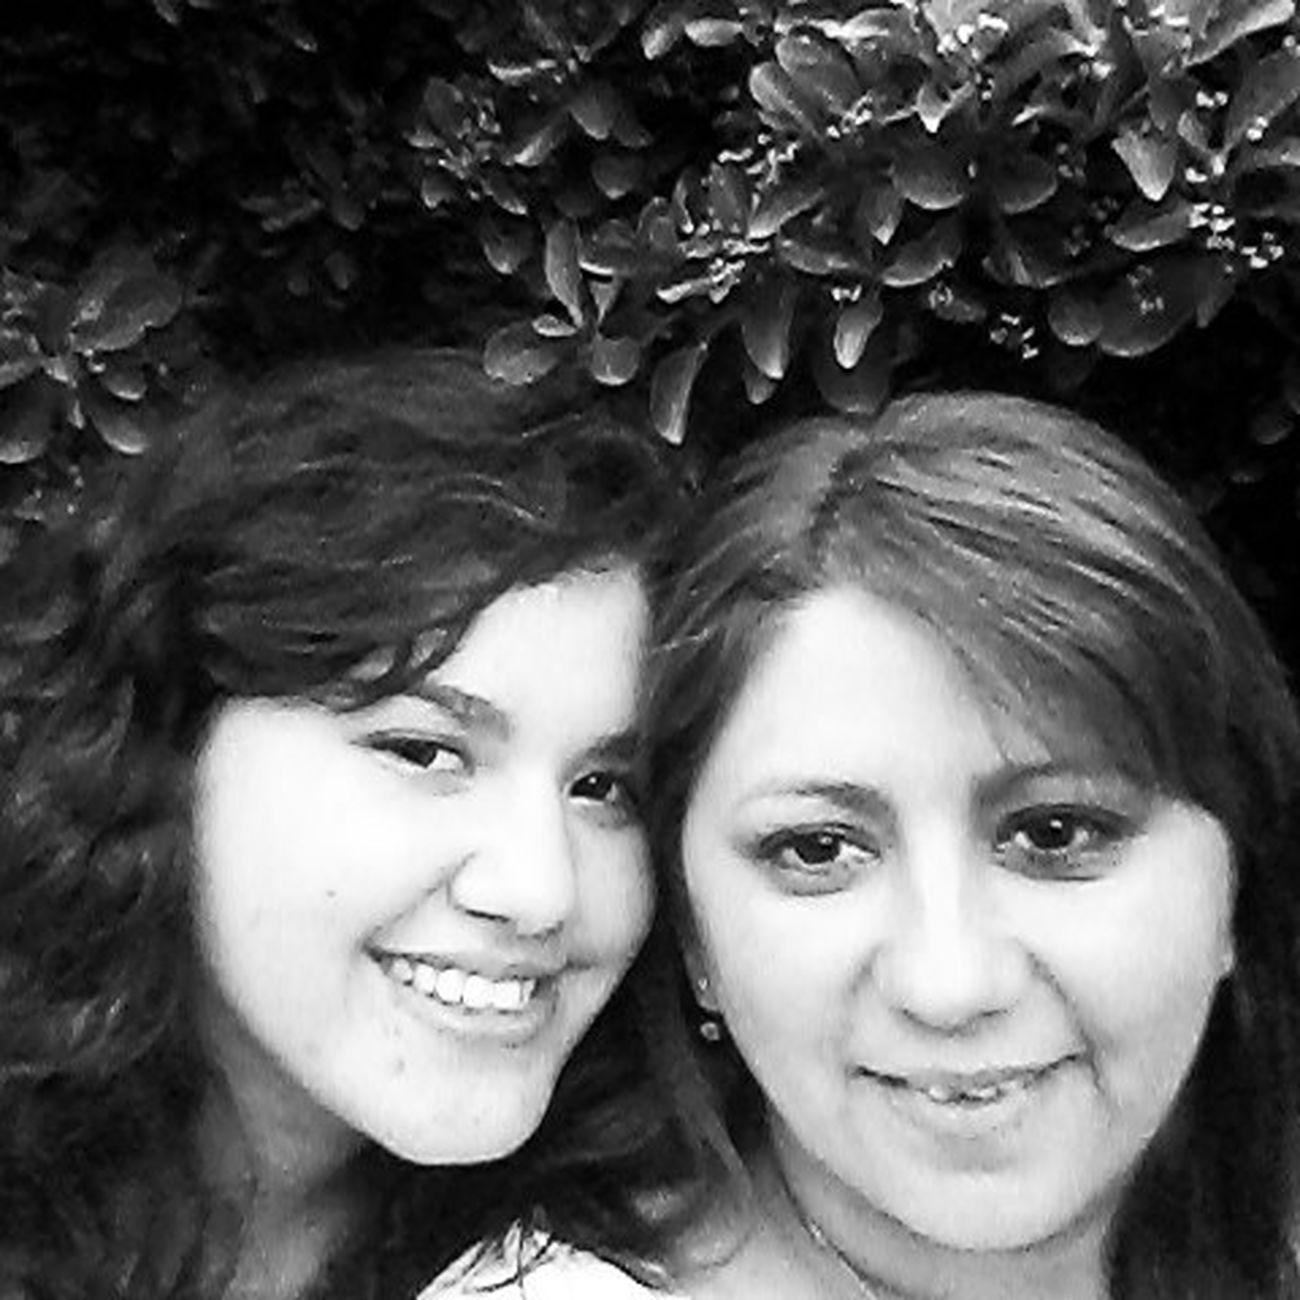 Te amo sister! Hermanas Teamo